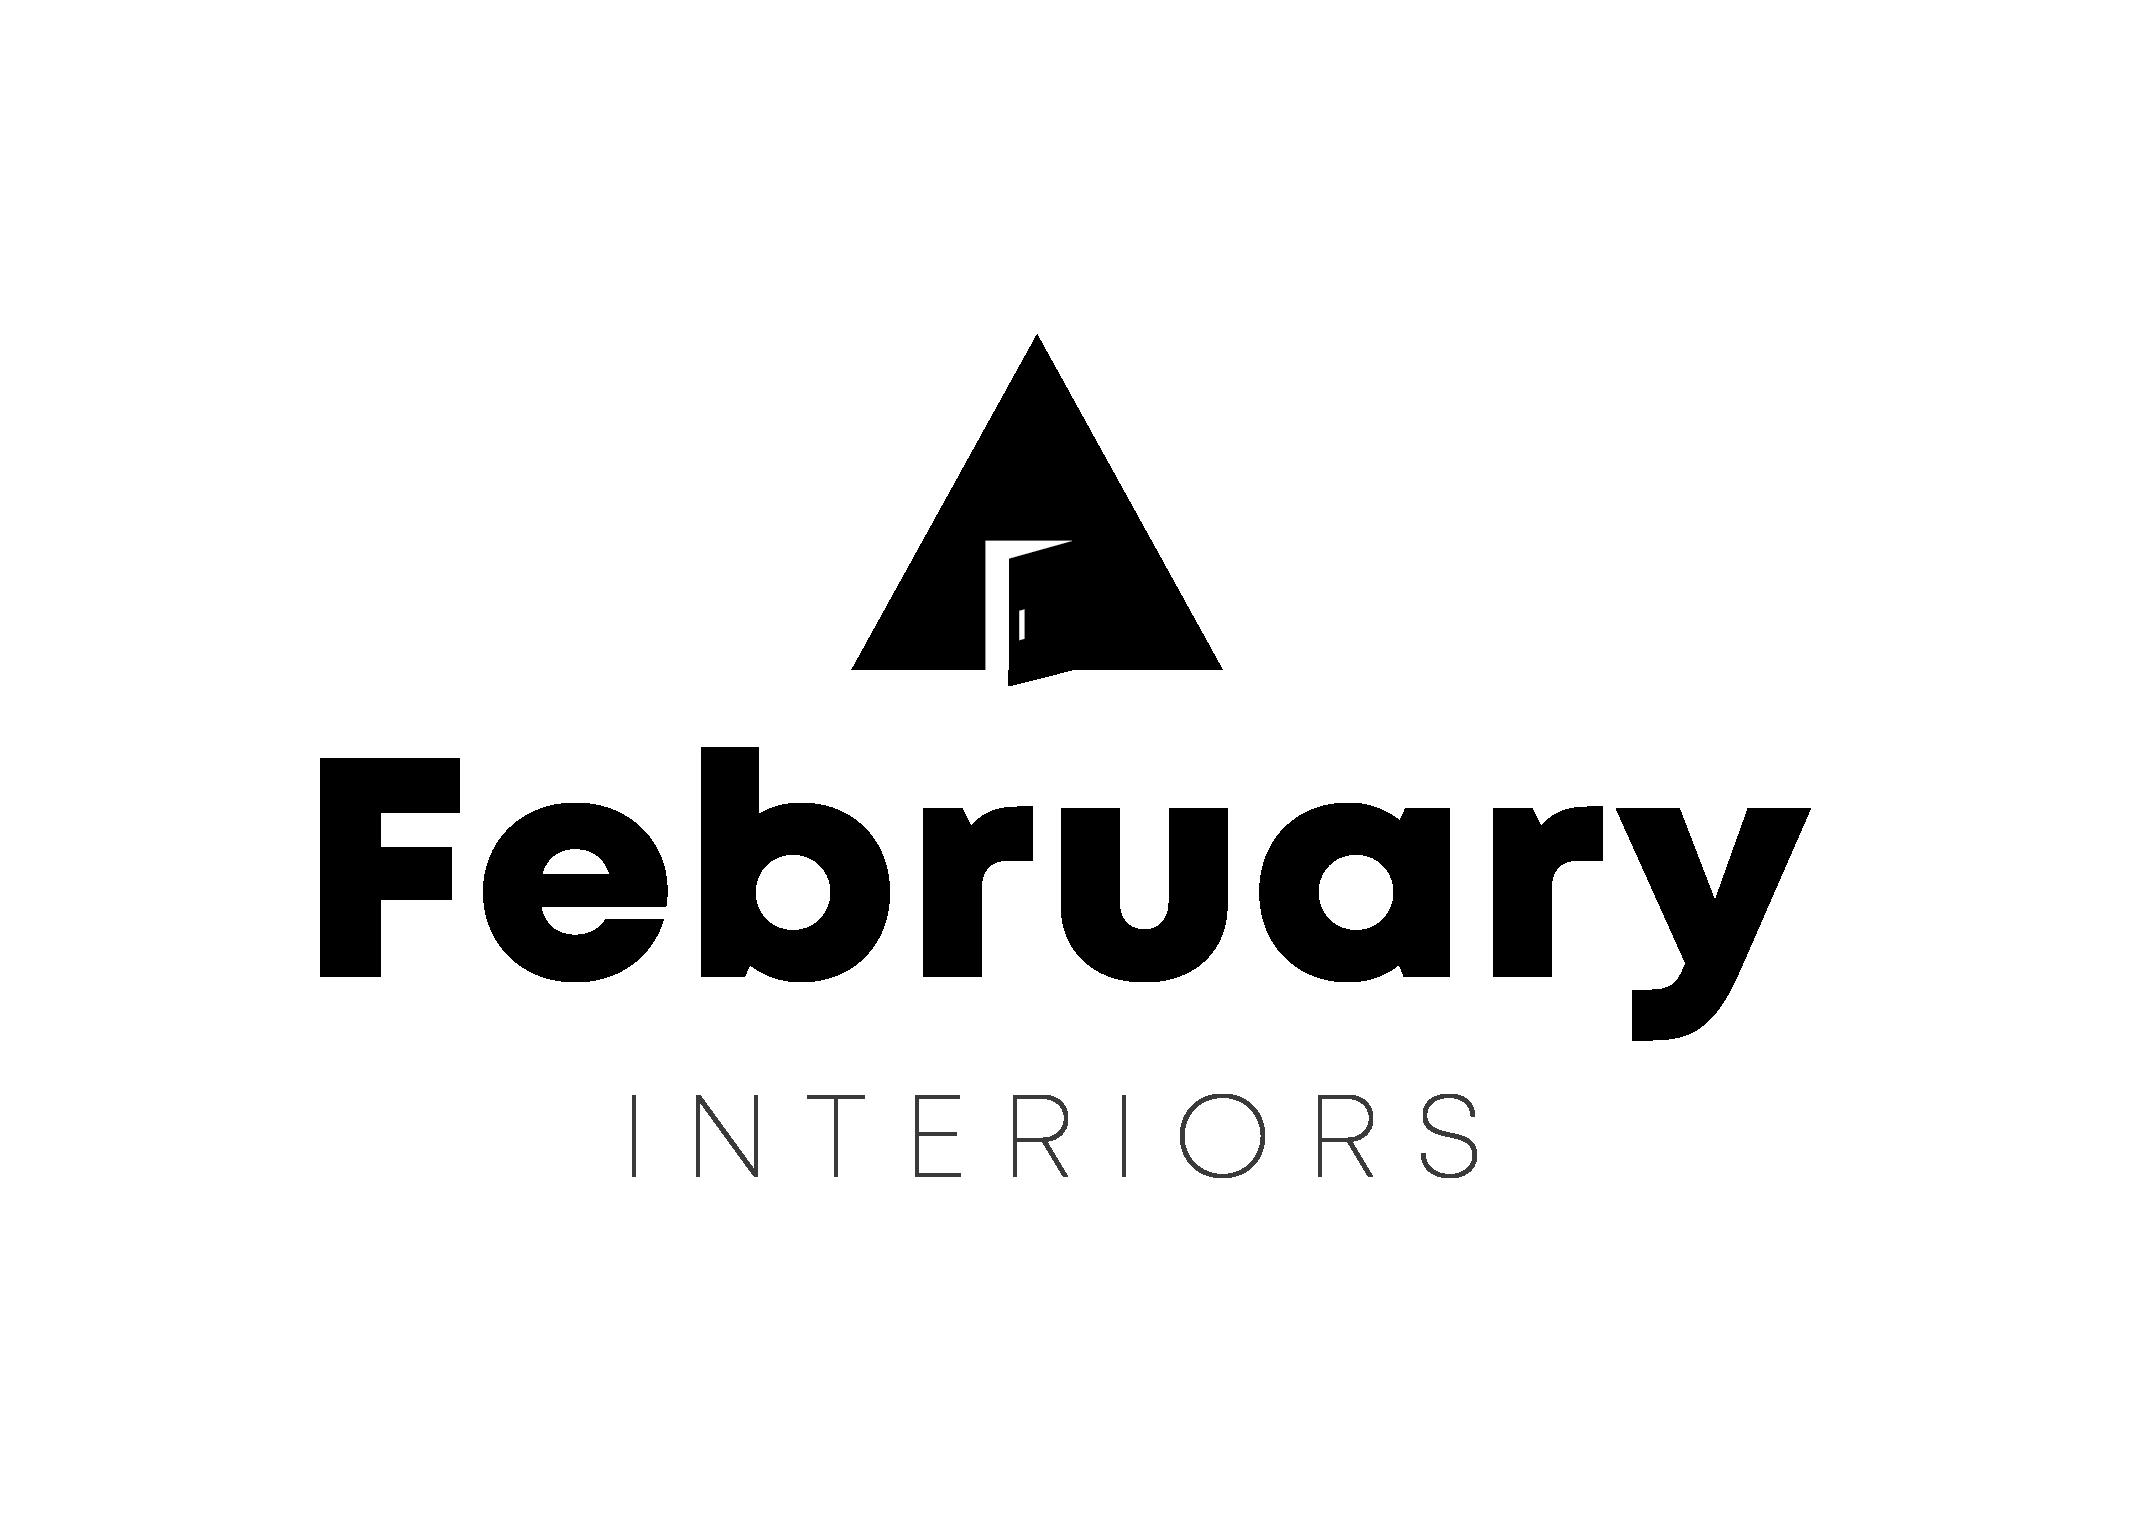 February Interiors